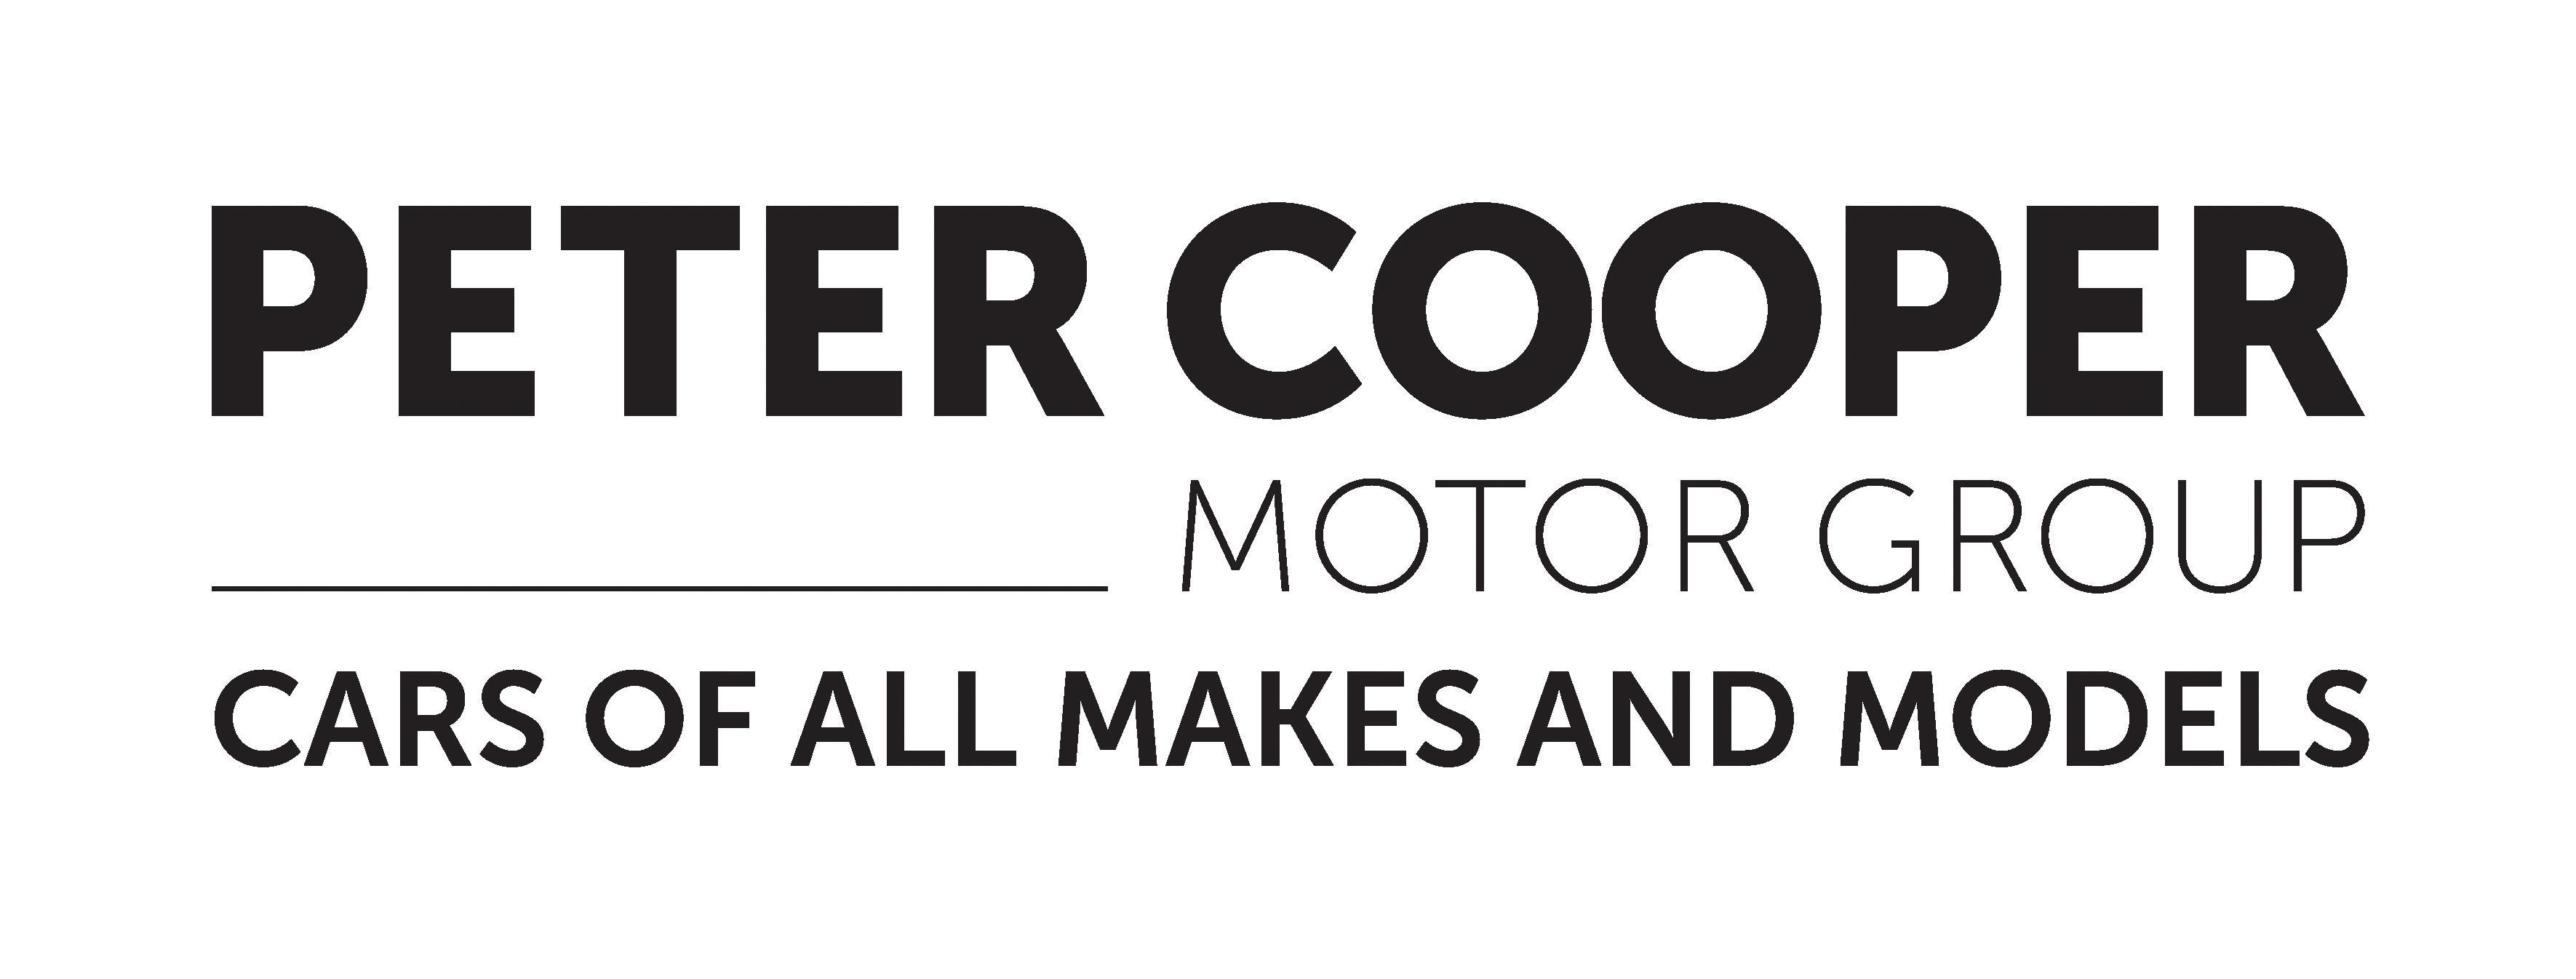 Peter Cooper Motor Group 3